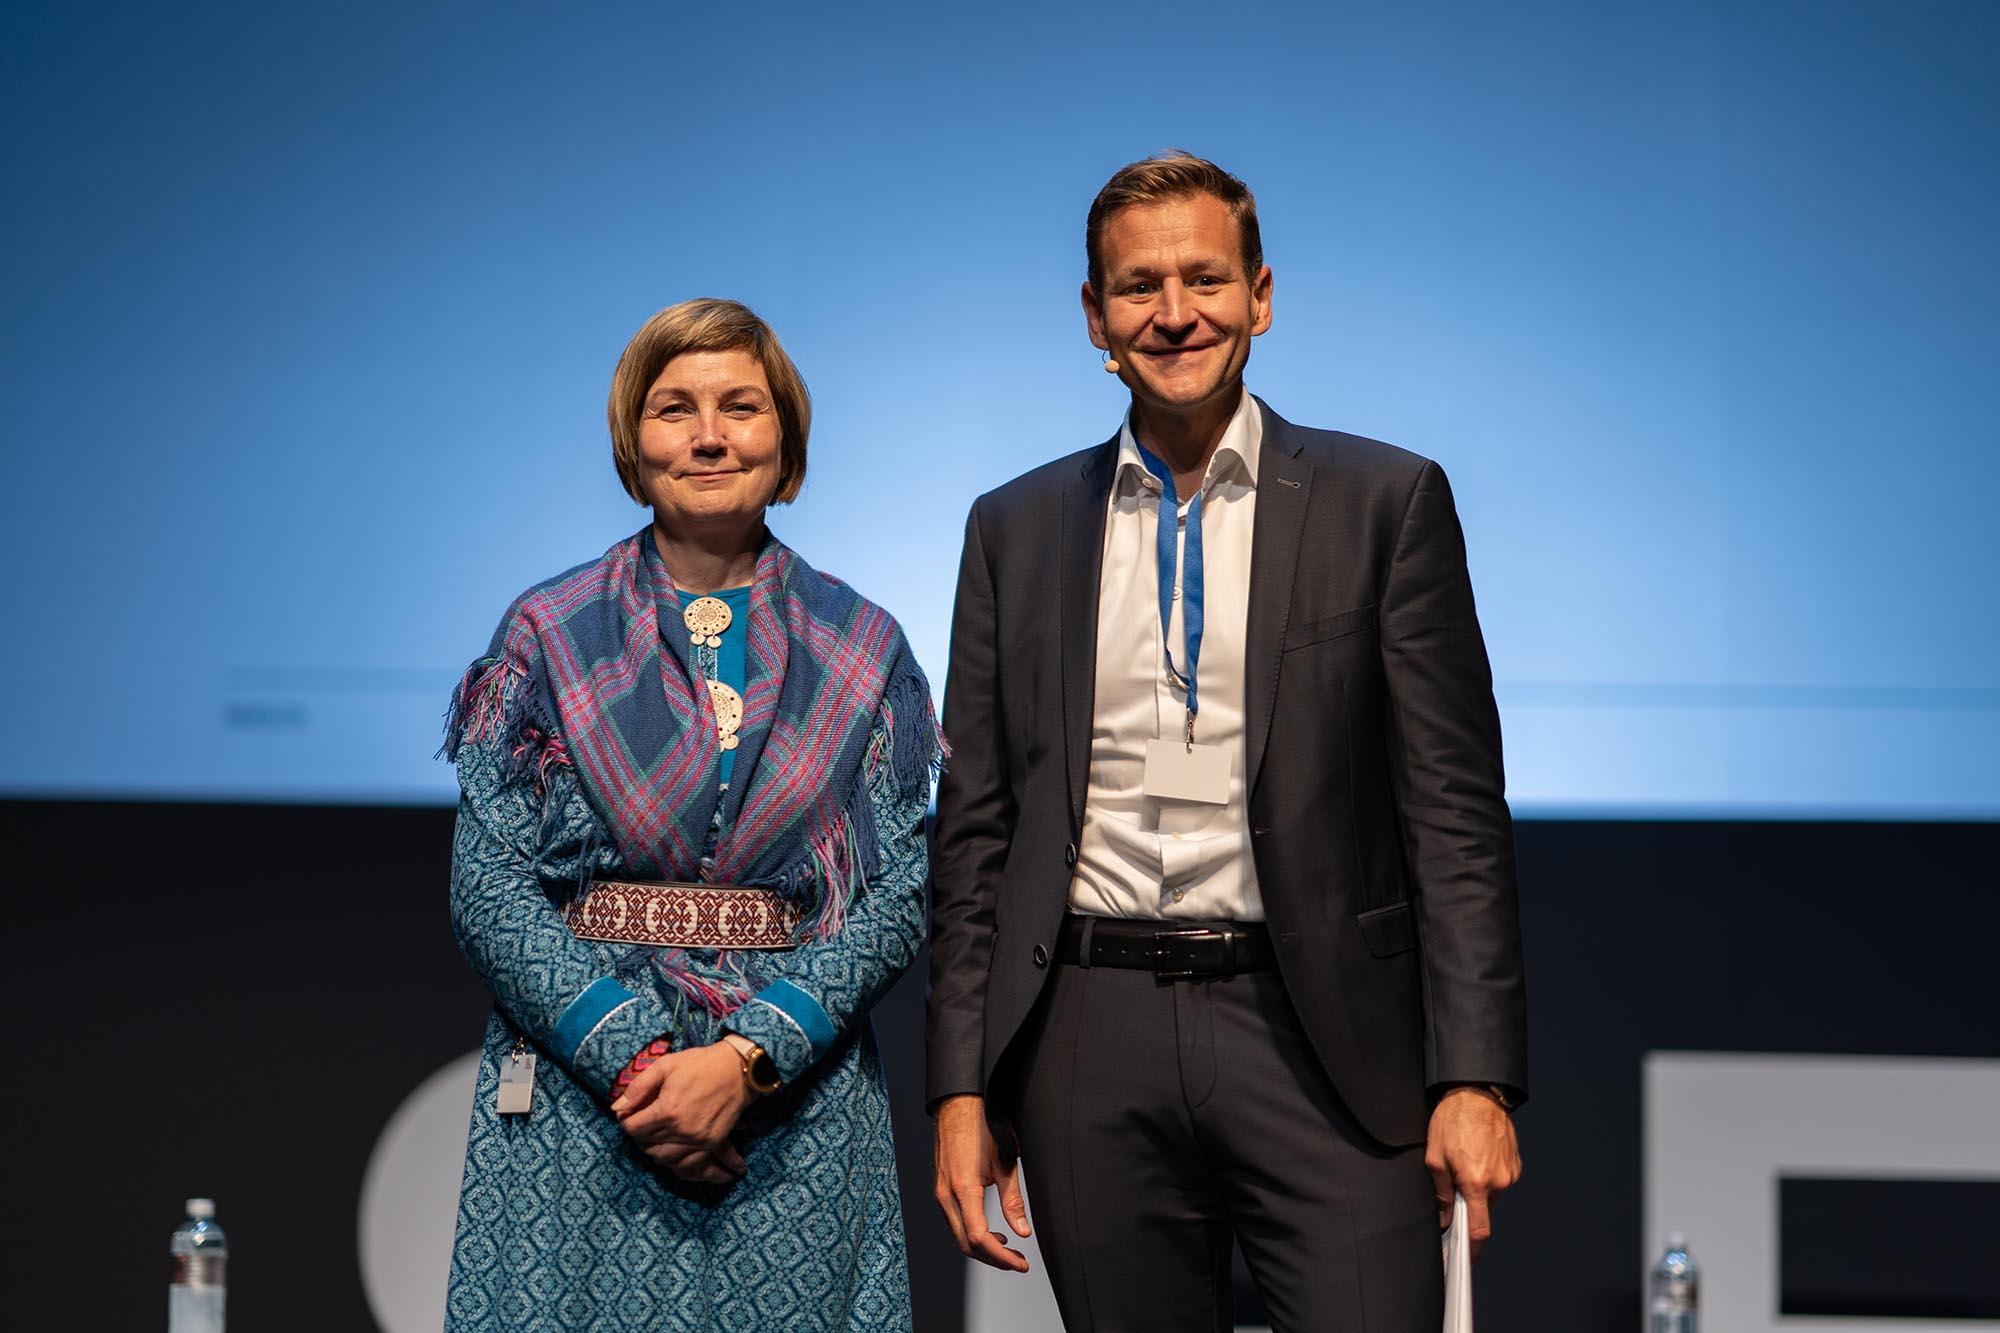 SGES Keynote: Aili Keskitalo, President of the Sami Parliament; Dominique Reber, Partner, Hirzel.Neef.Schmid.Konsulenten; Mitglied Beirat SGES